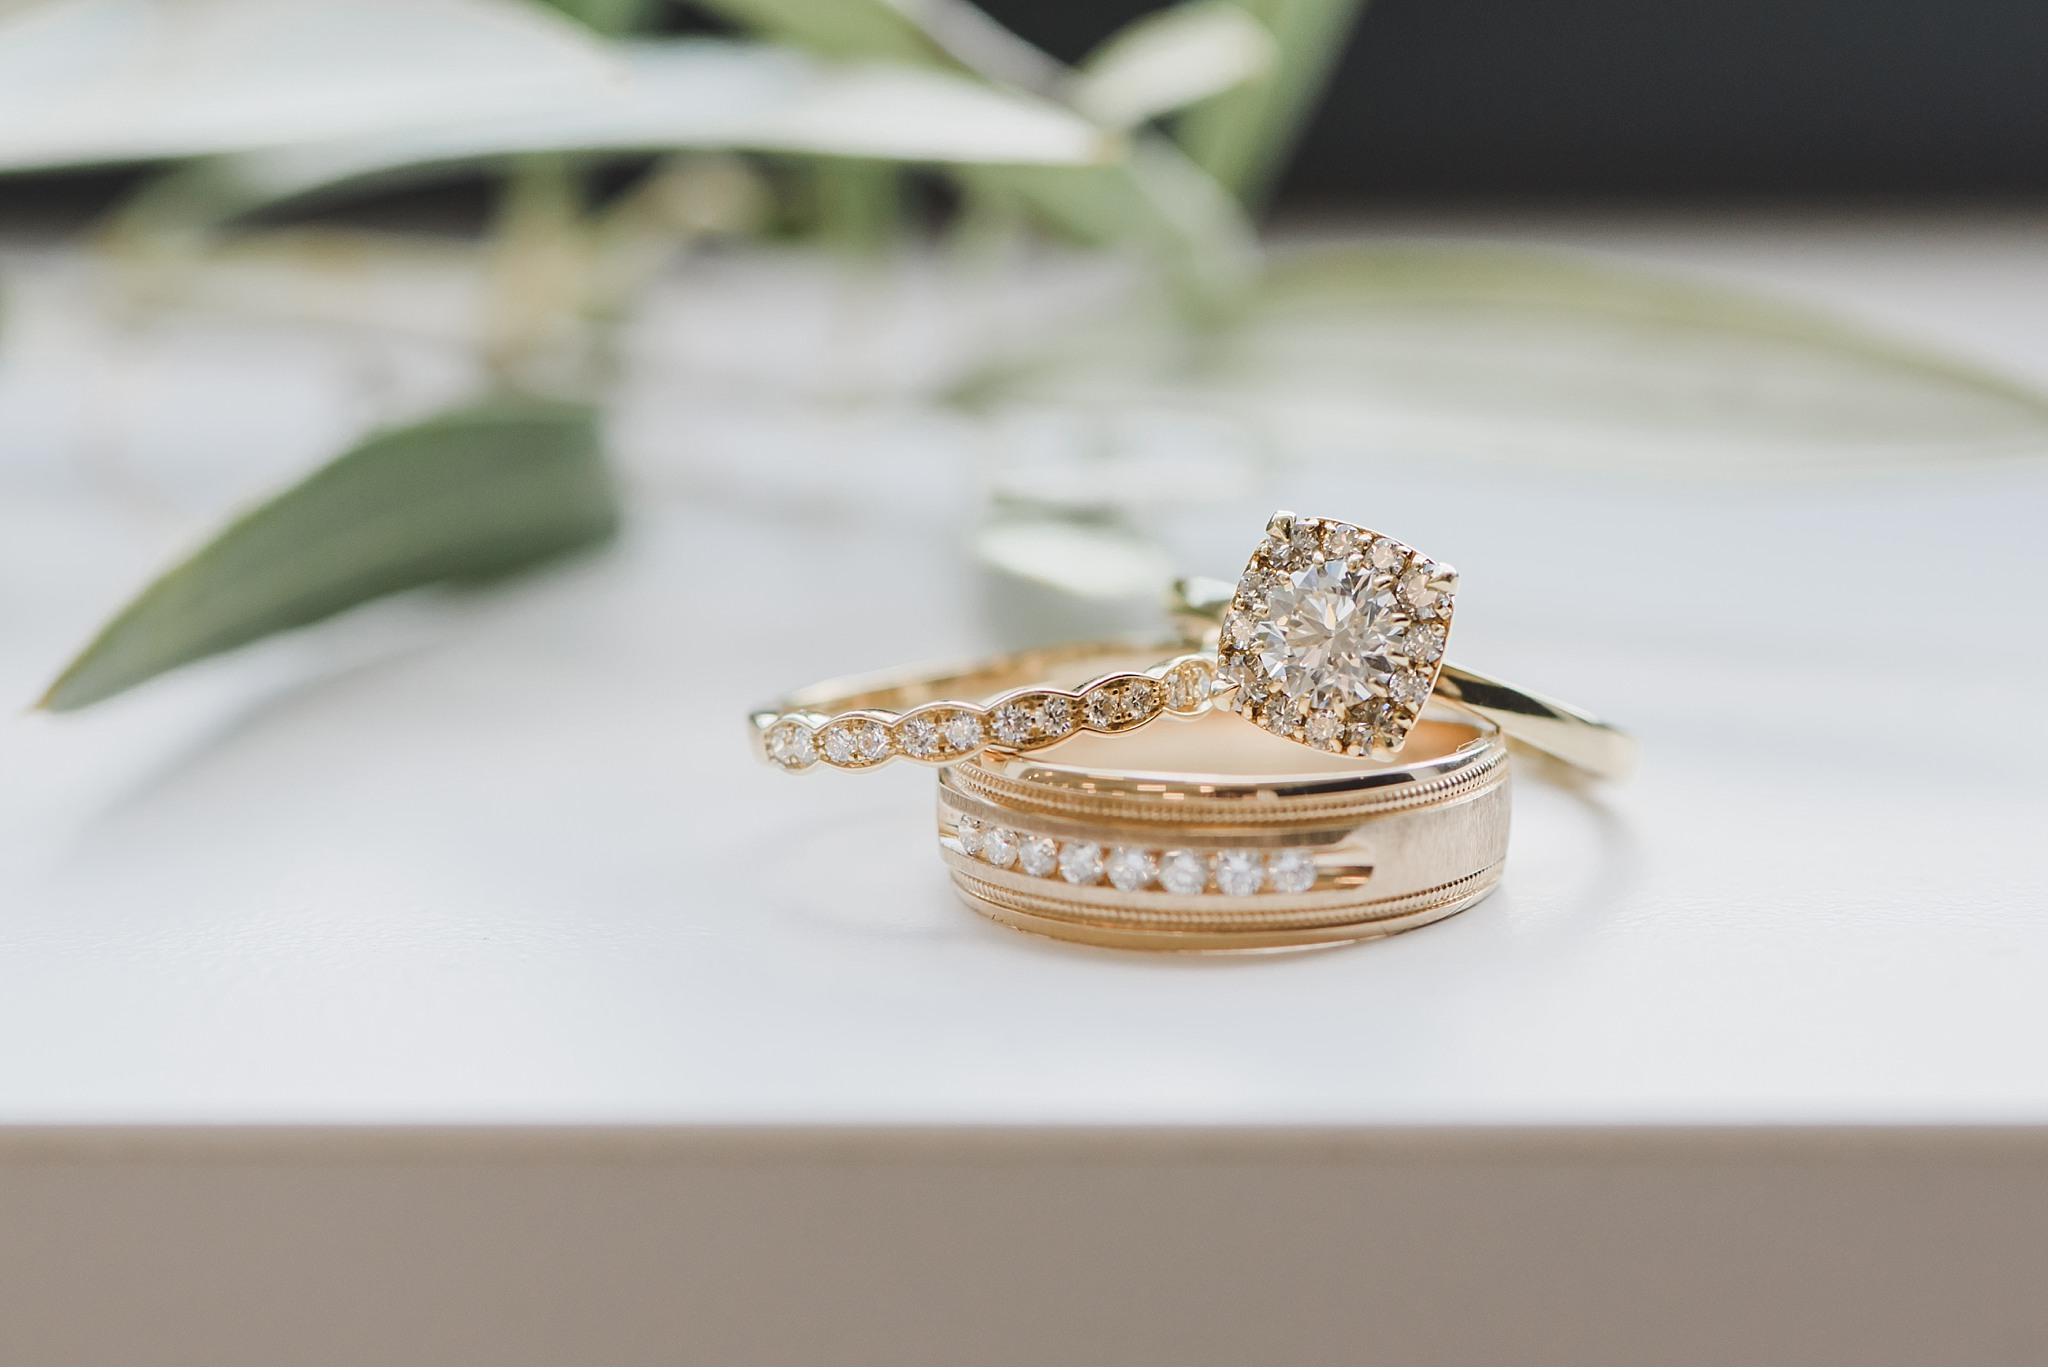 Beautiful Koser Jewlery diamond Light and Airy Styled Greek Wedding Supply Manheim PA Wedding photography photo_1901.jpg